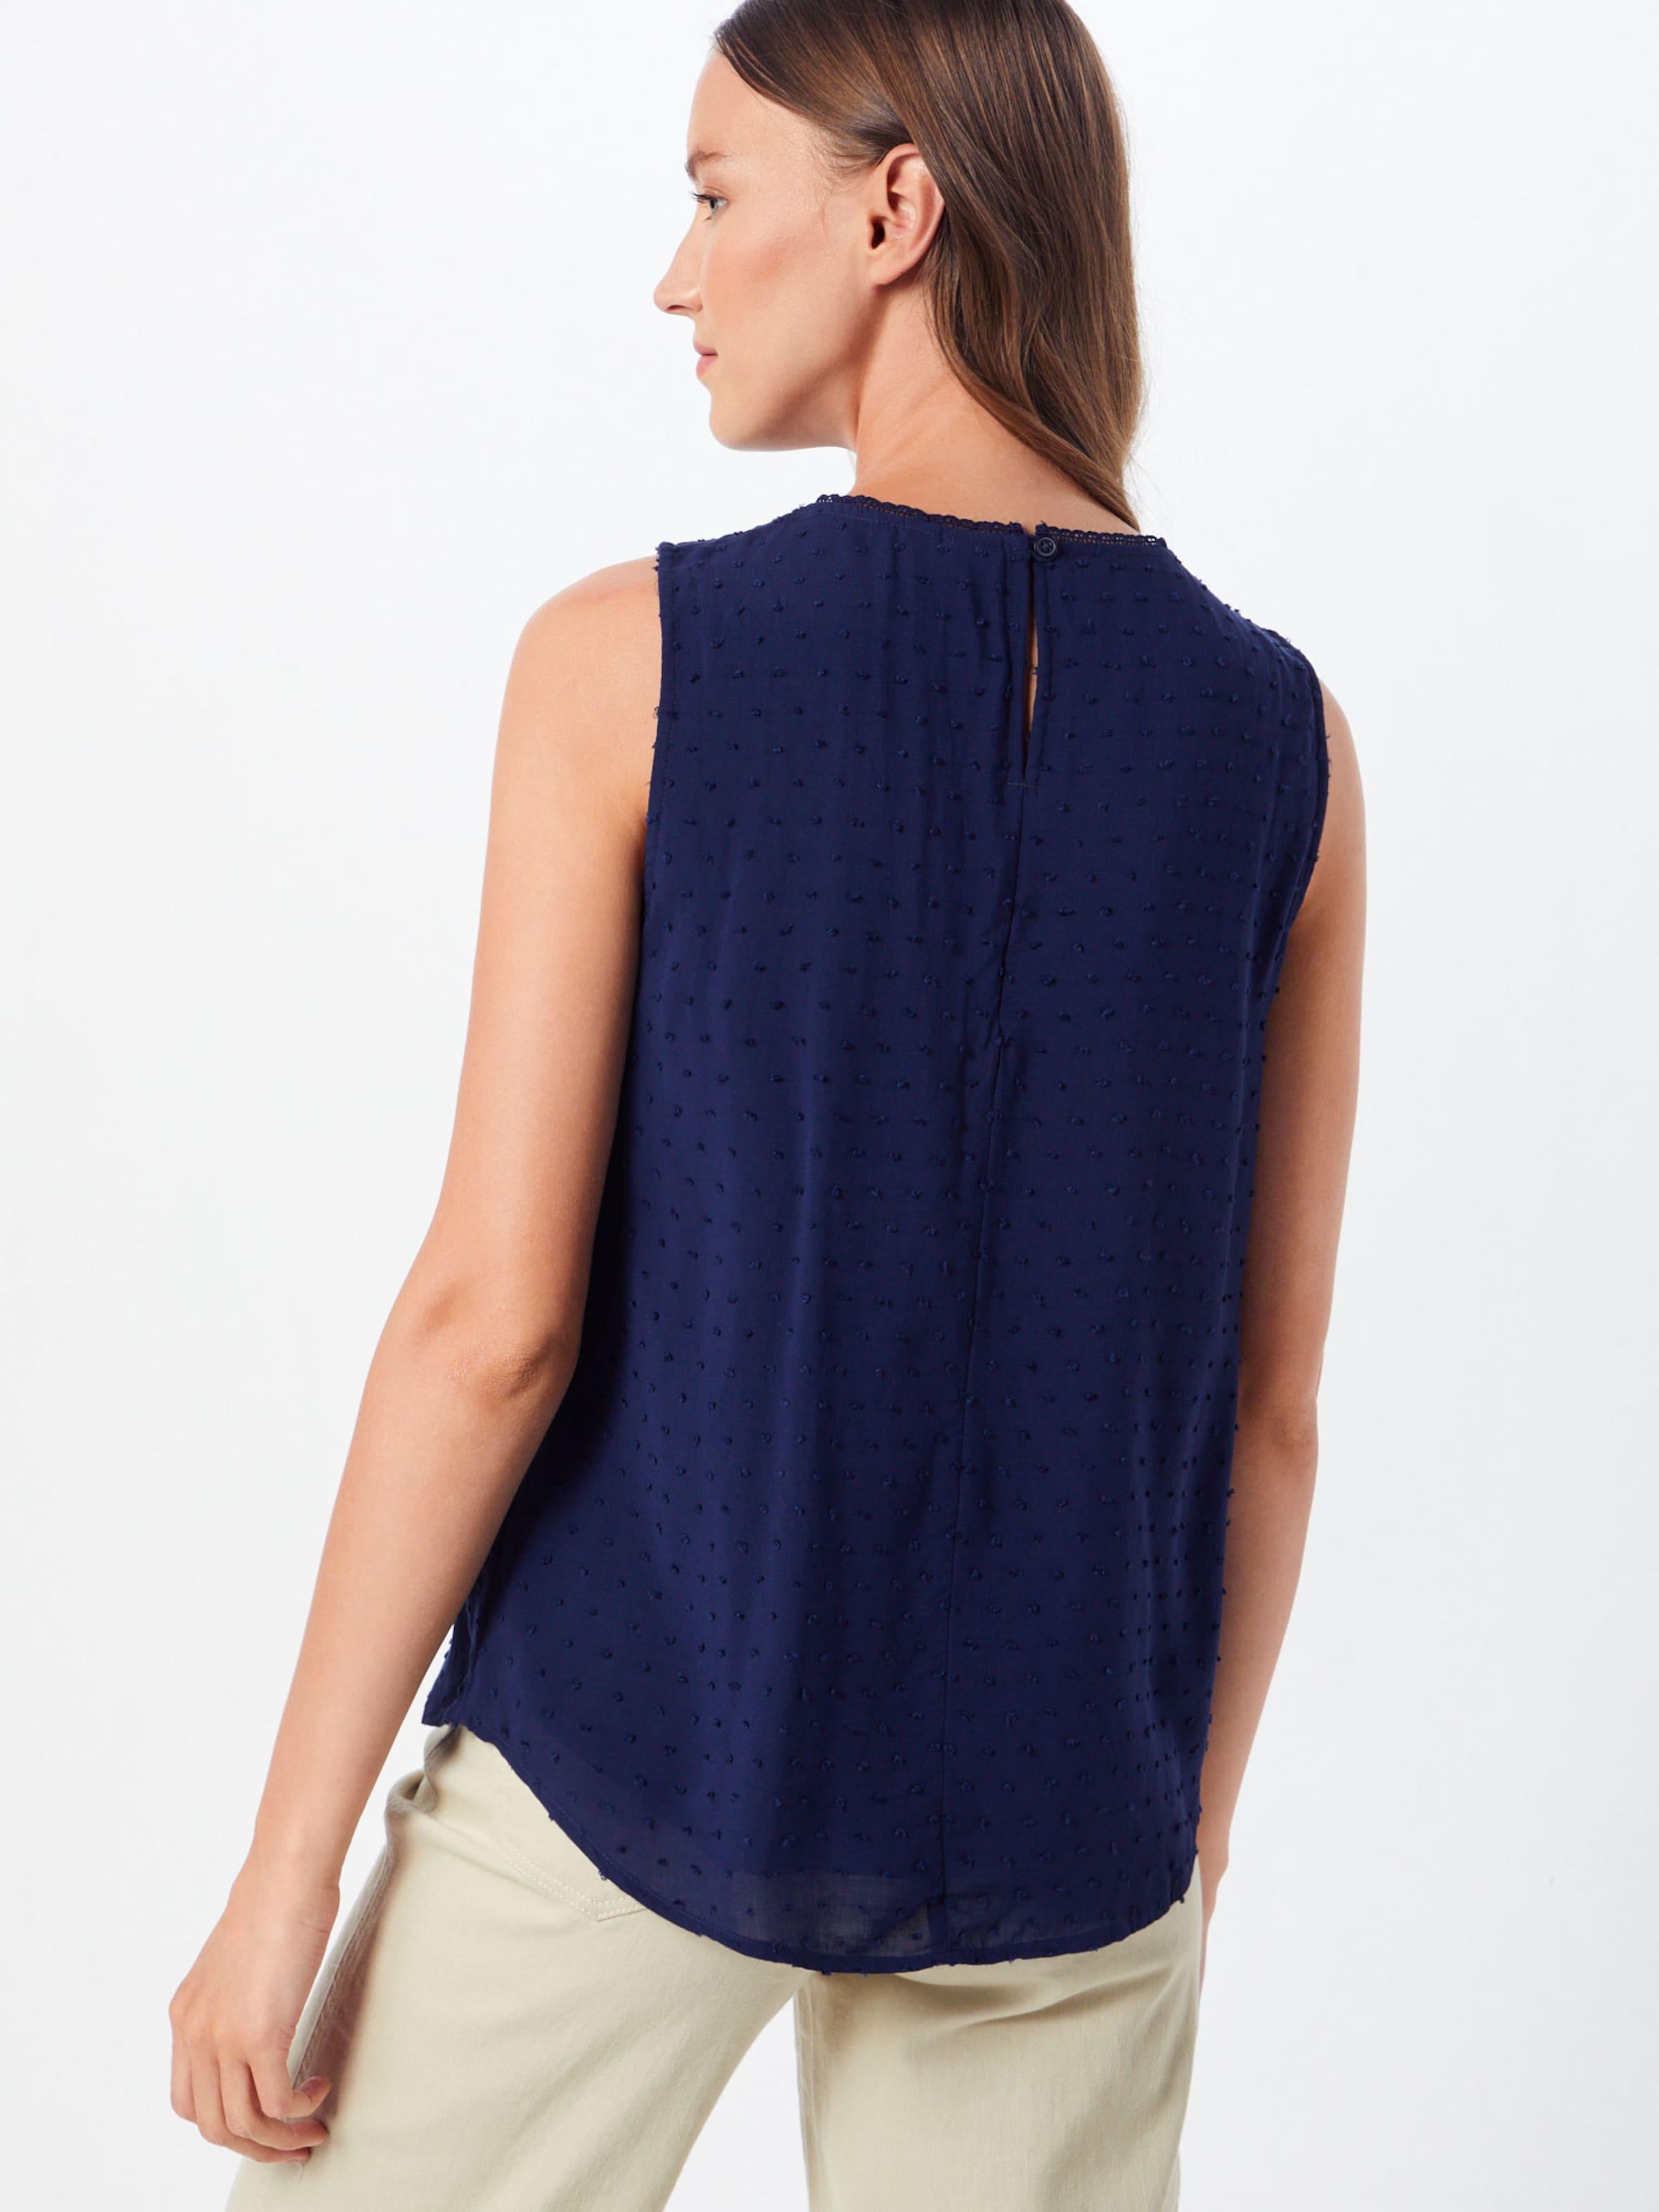 En Bleu shirt T Gap Marine 4RL3j5Aq